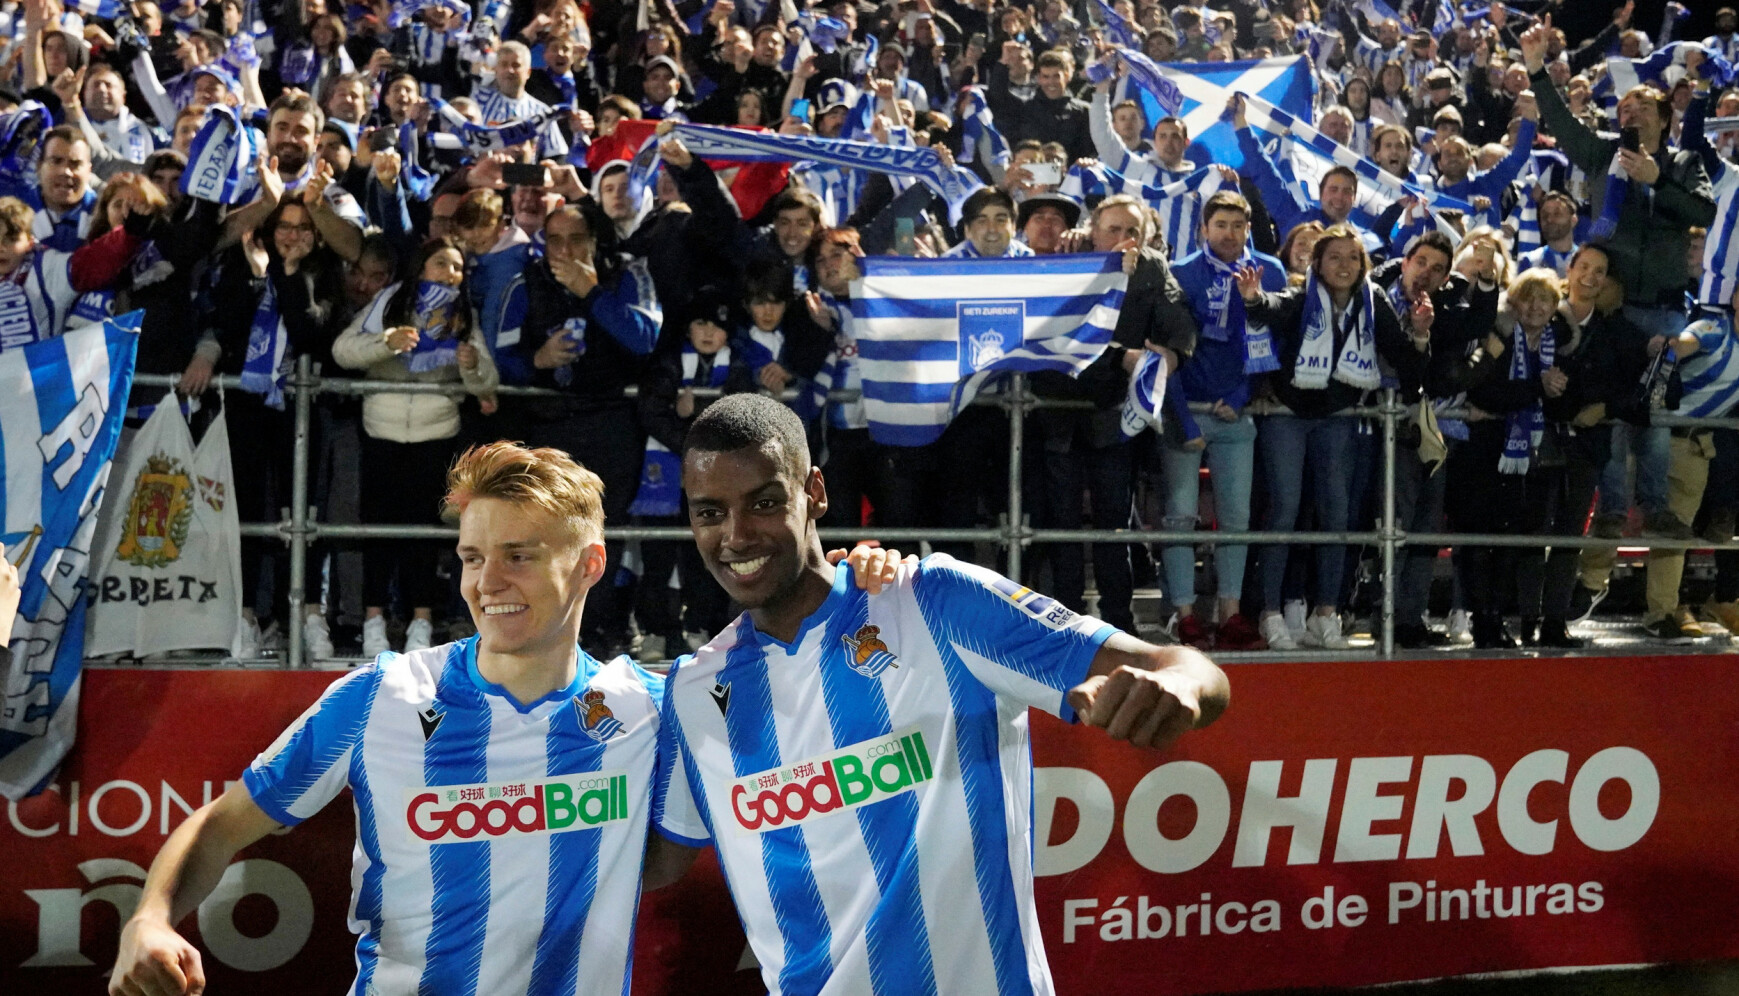 DEN GANG DA: Slik så det ut da Martin Ødegaard, Alexander Isak og resten av Real Sociedad hadde tatt seg til den spanske cupfinalen. Foto: REUTERS/Vincent West